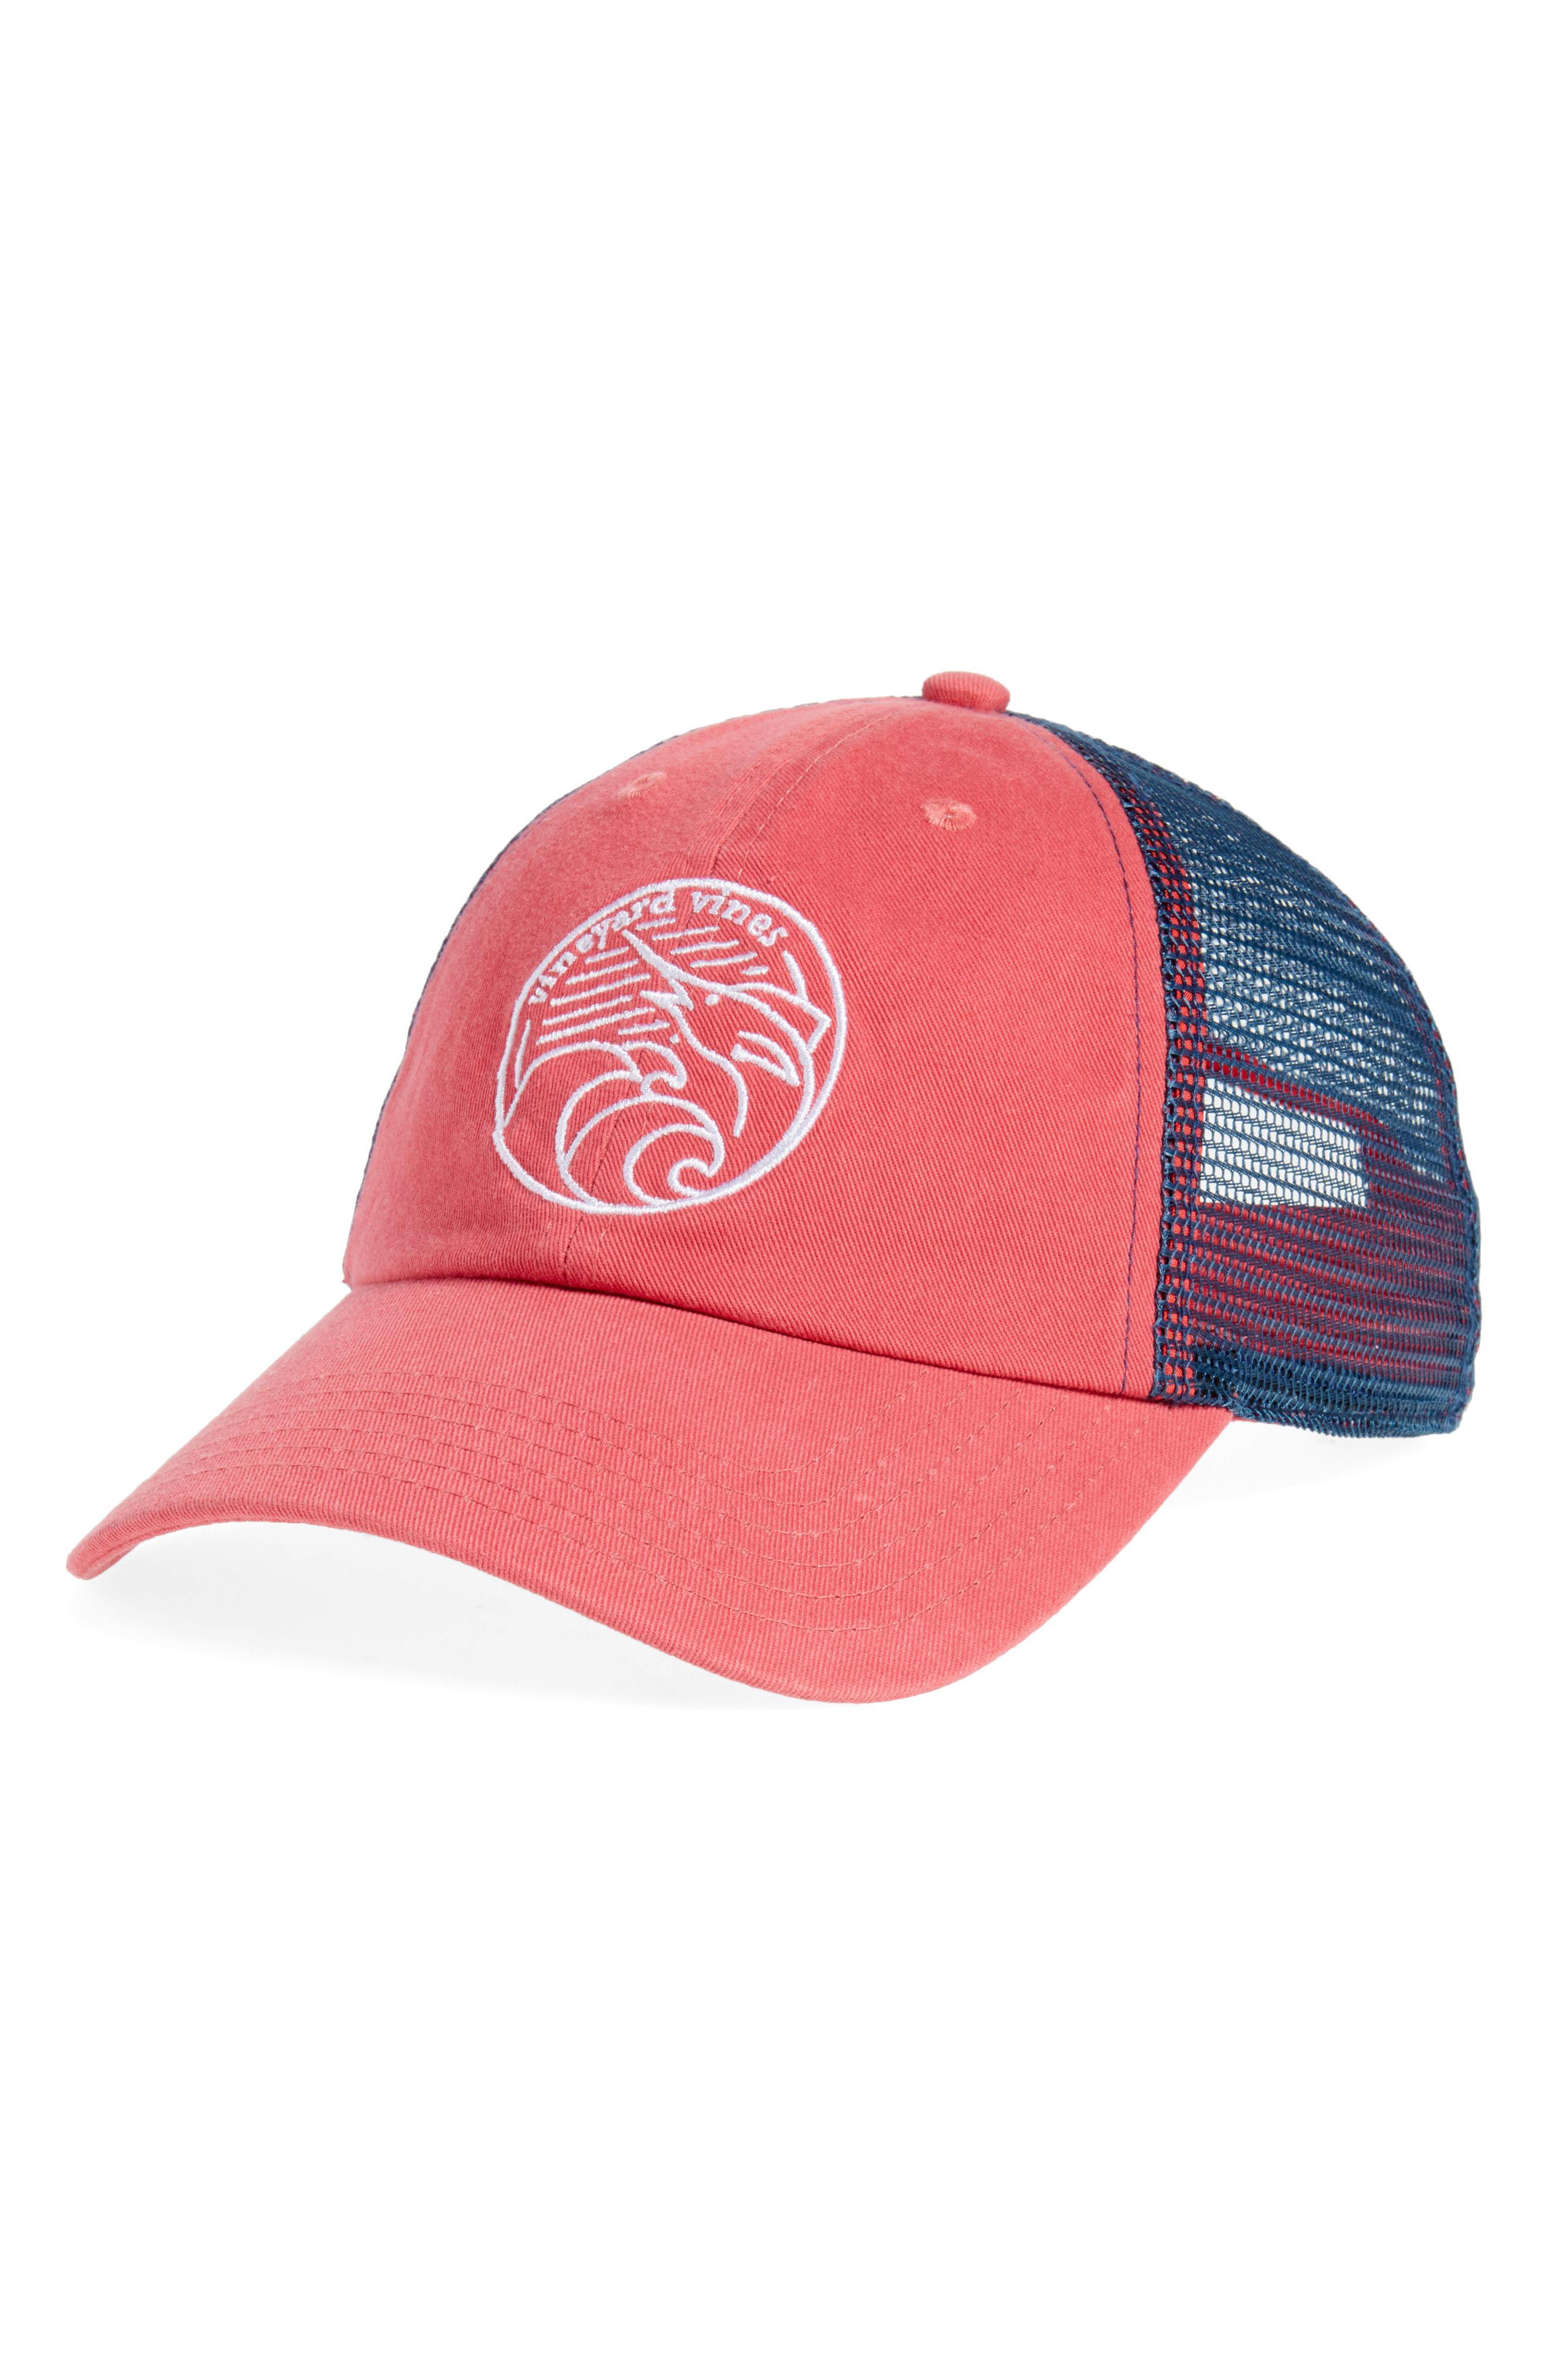 43044785191 Vineyard Vines - Red Low Pro Marlin Trucker Cap for Men - Lyst